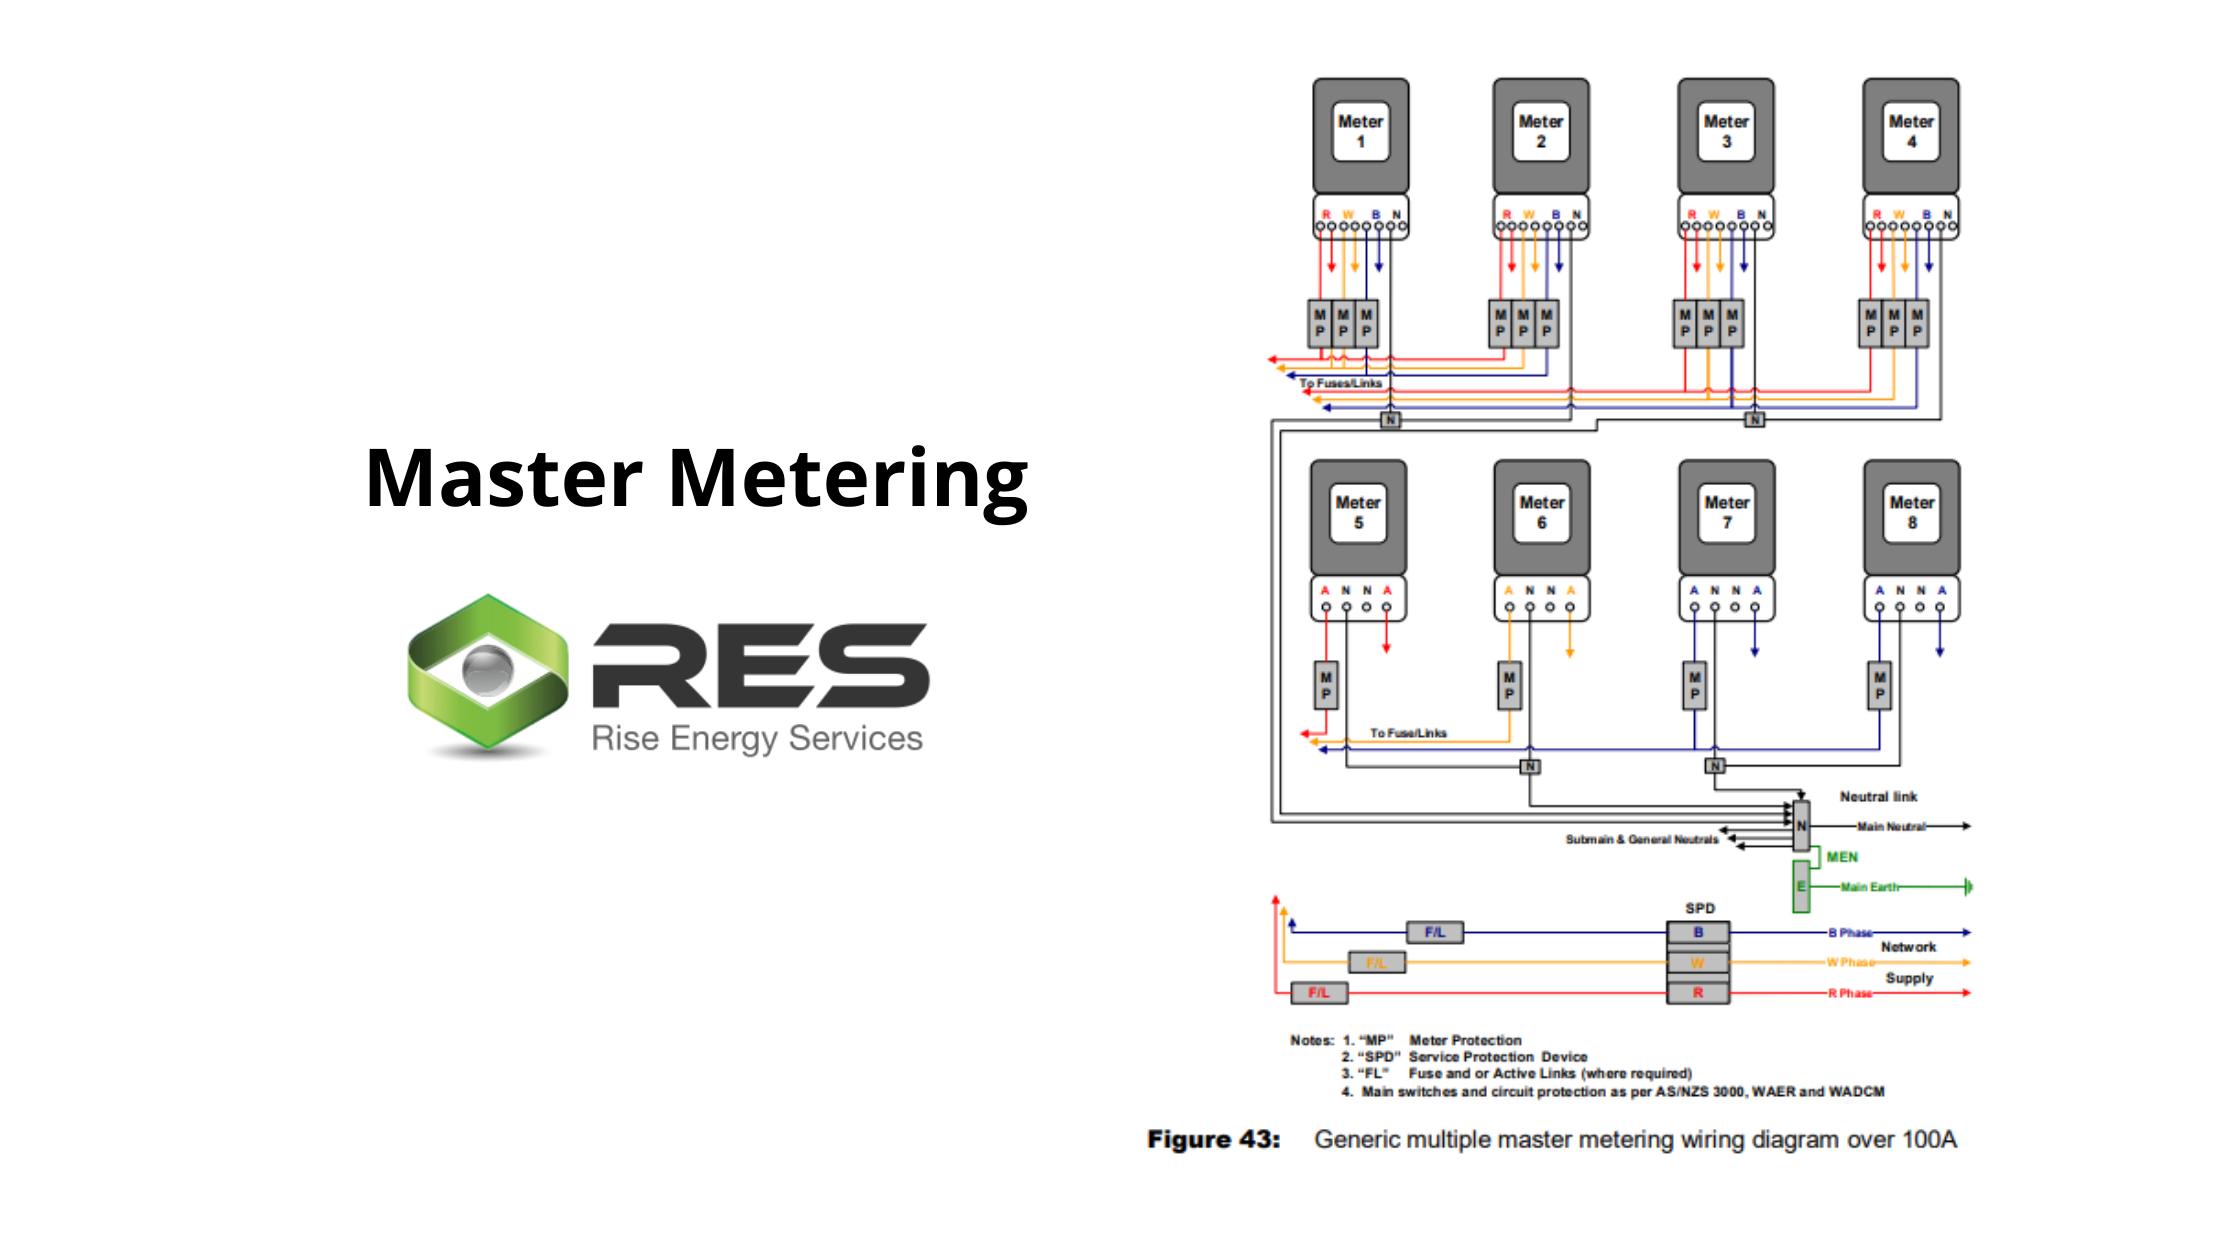 Master Metering